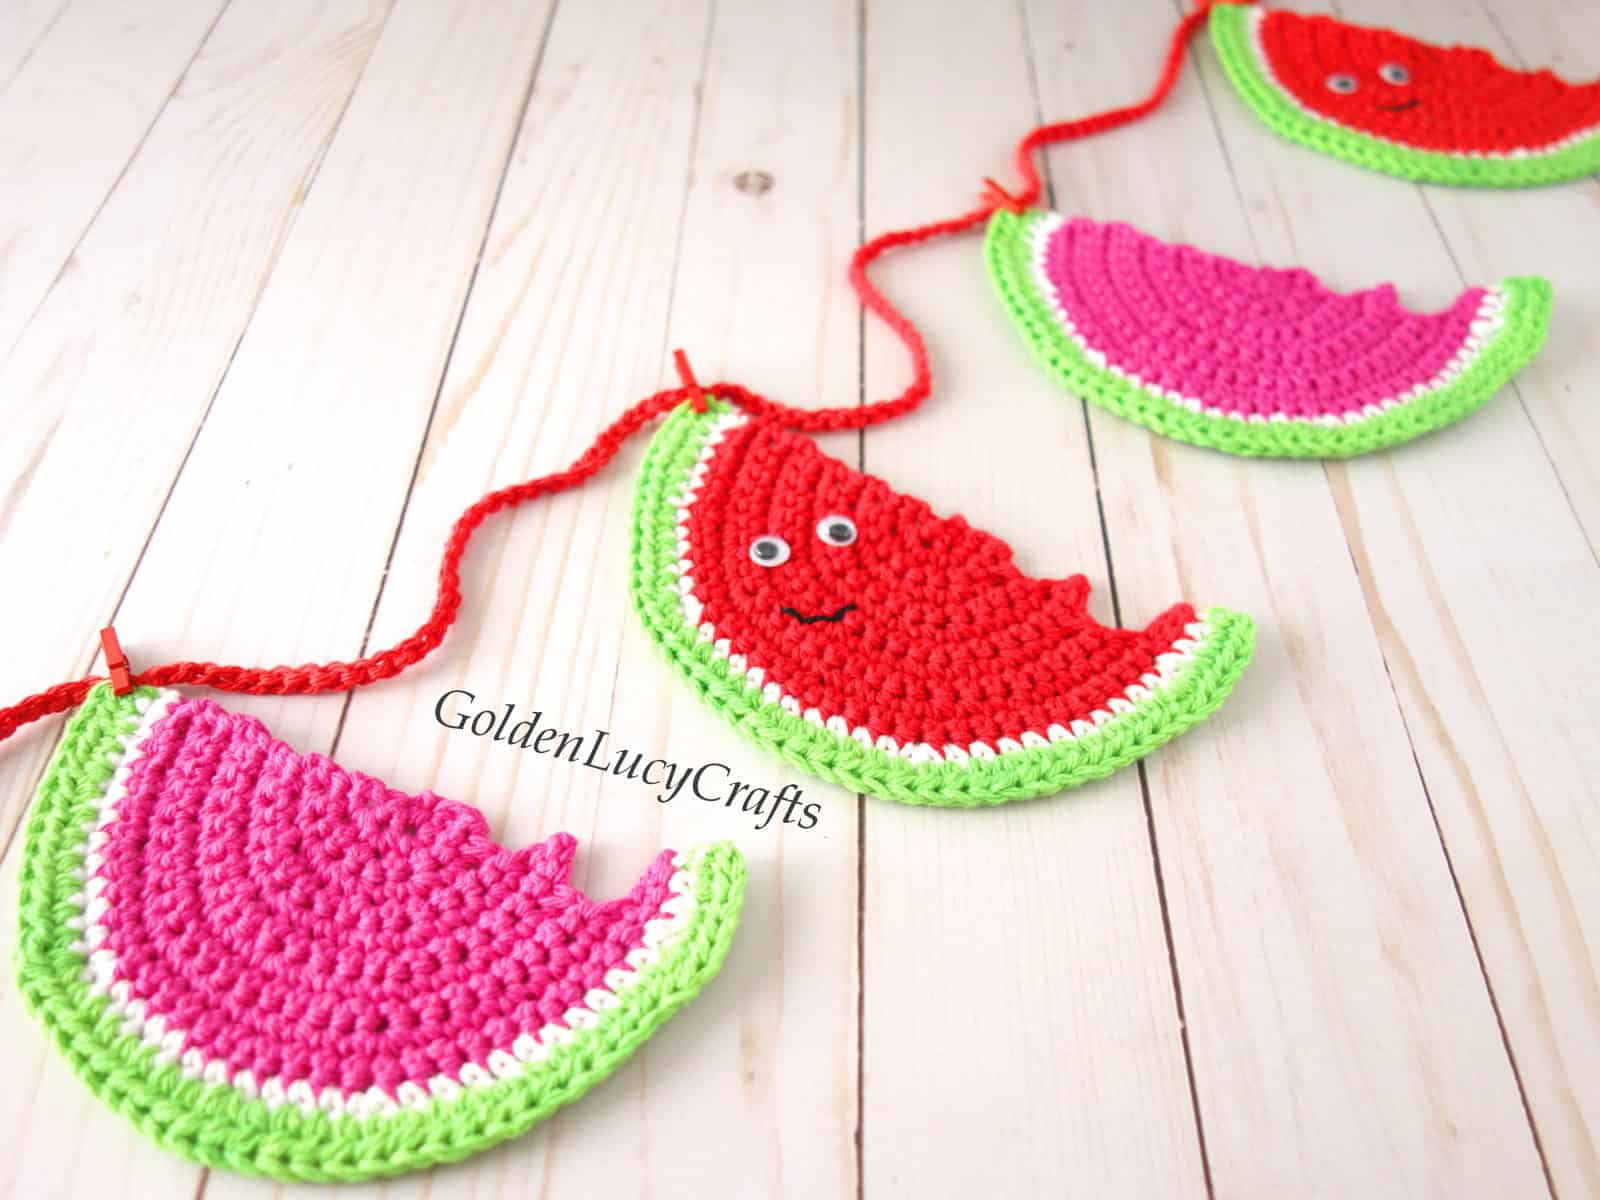 Crochet watermelon garland, close up image.